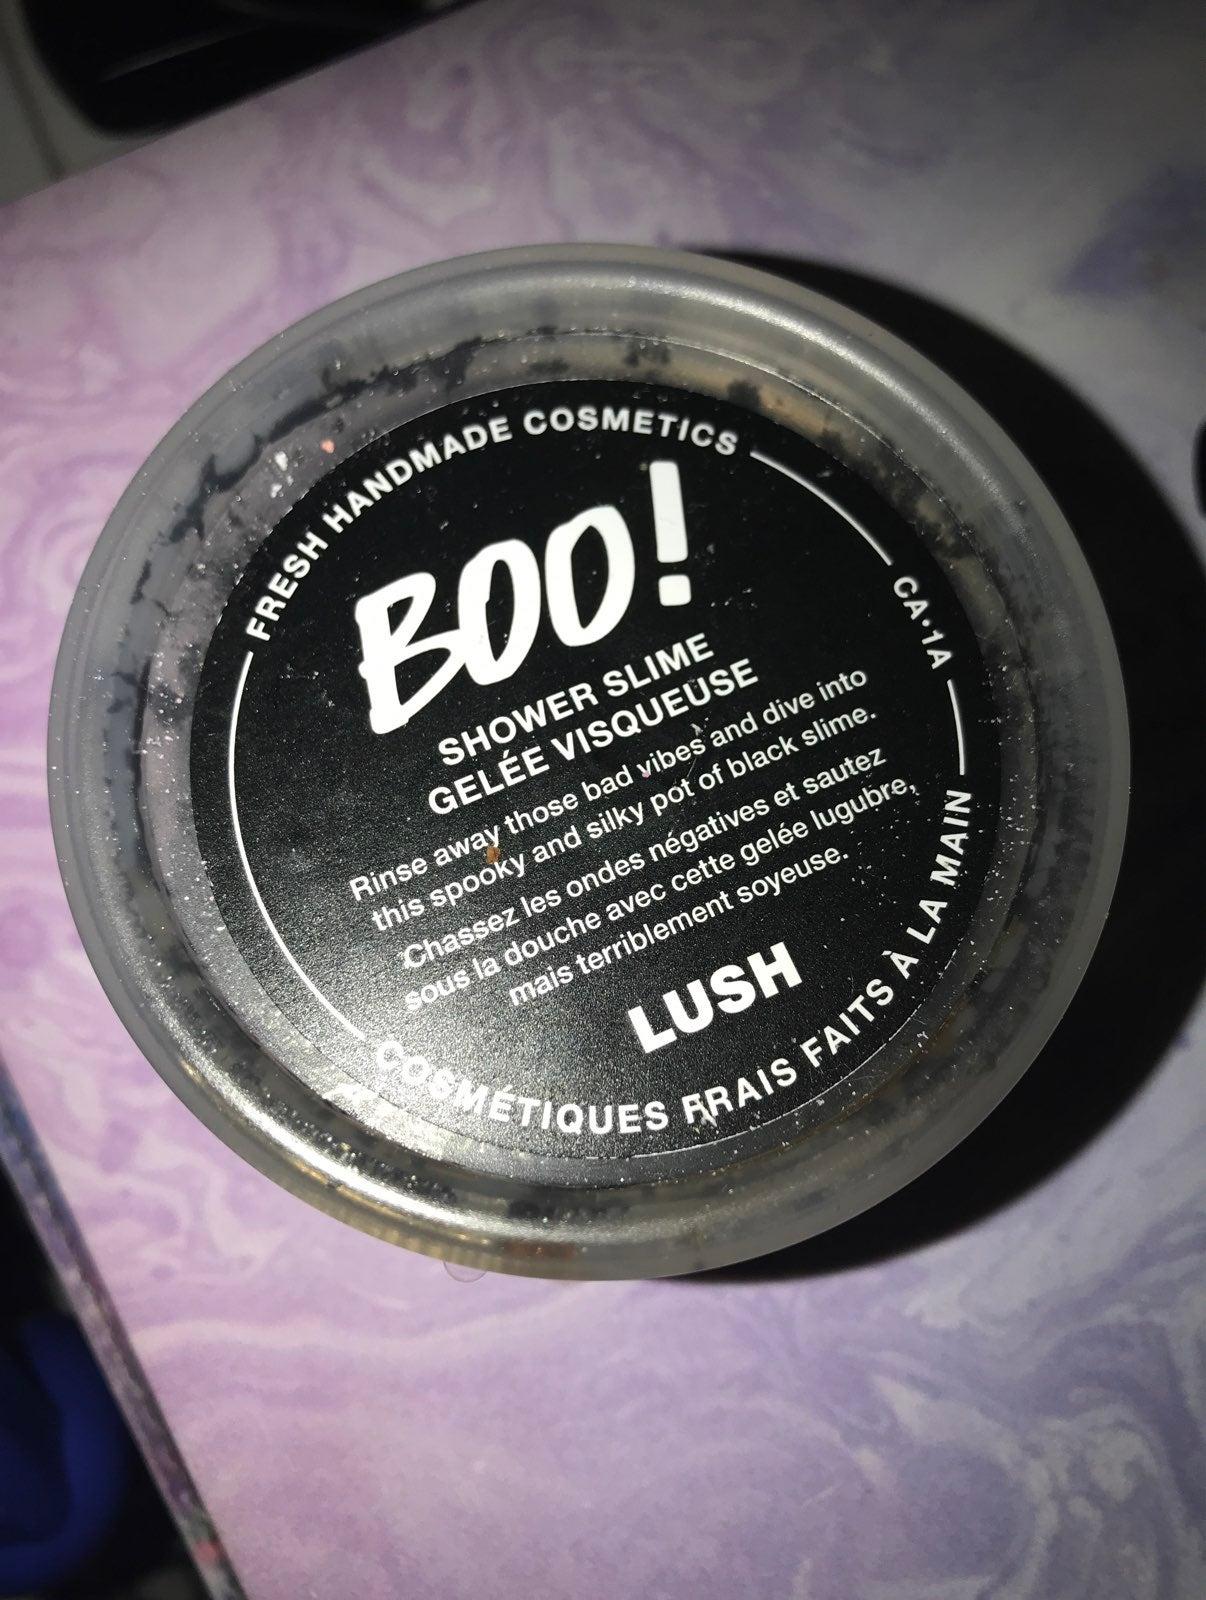 Lush boo shower jelly